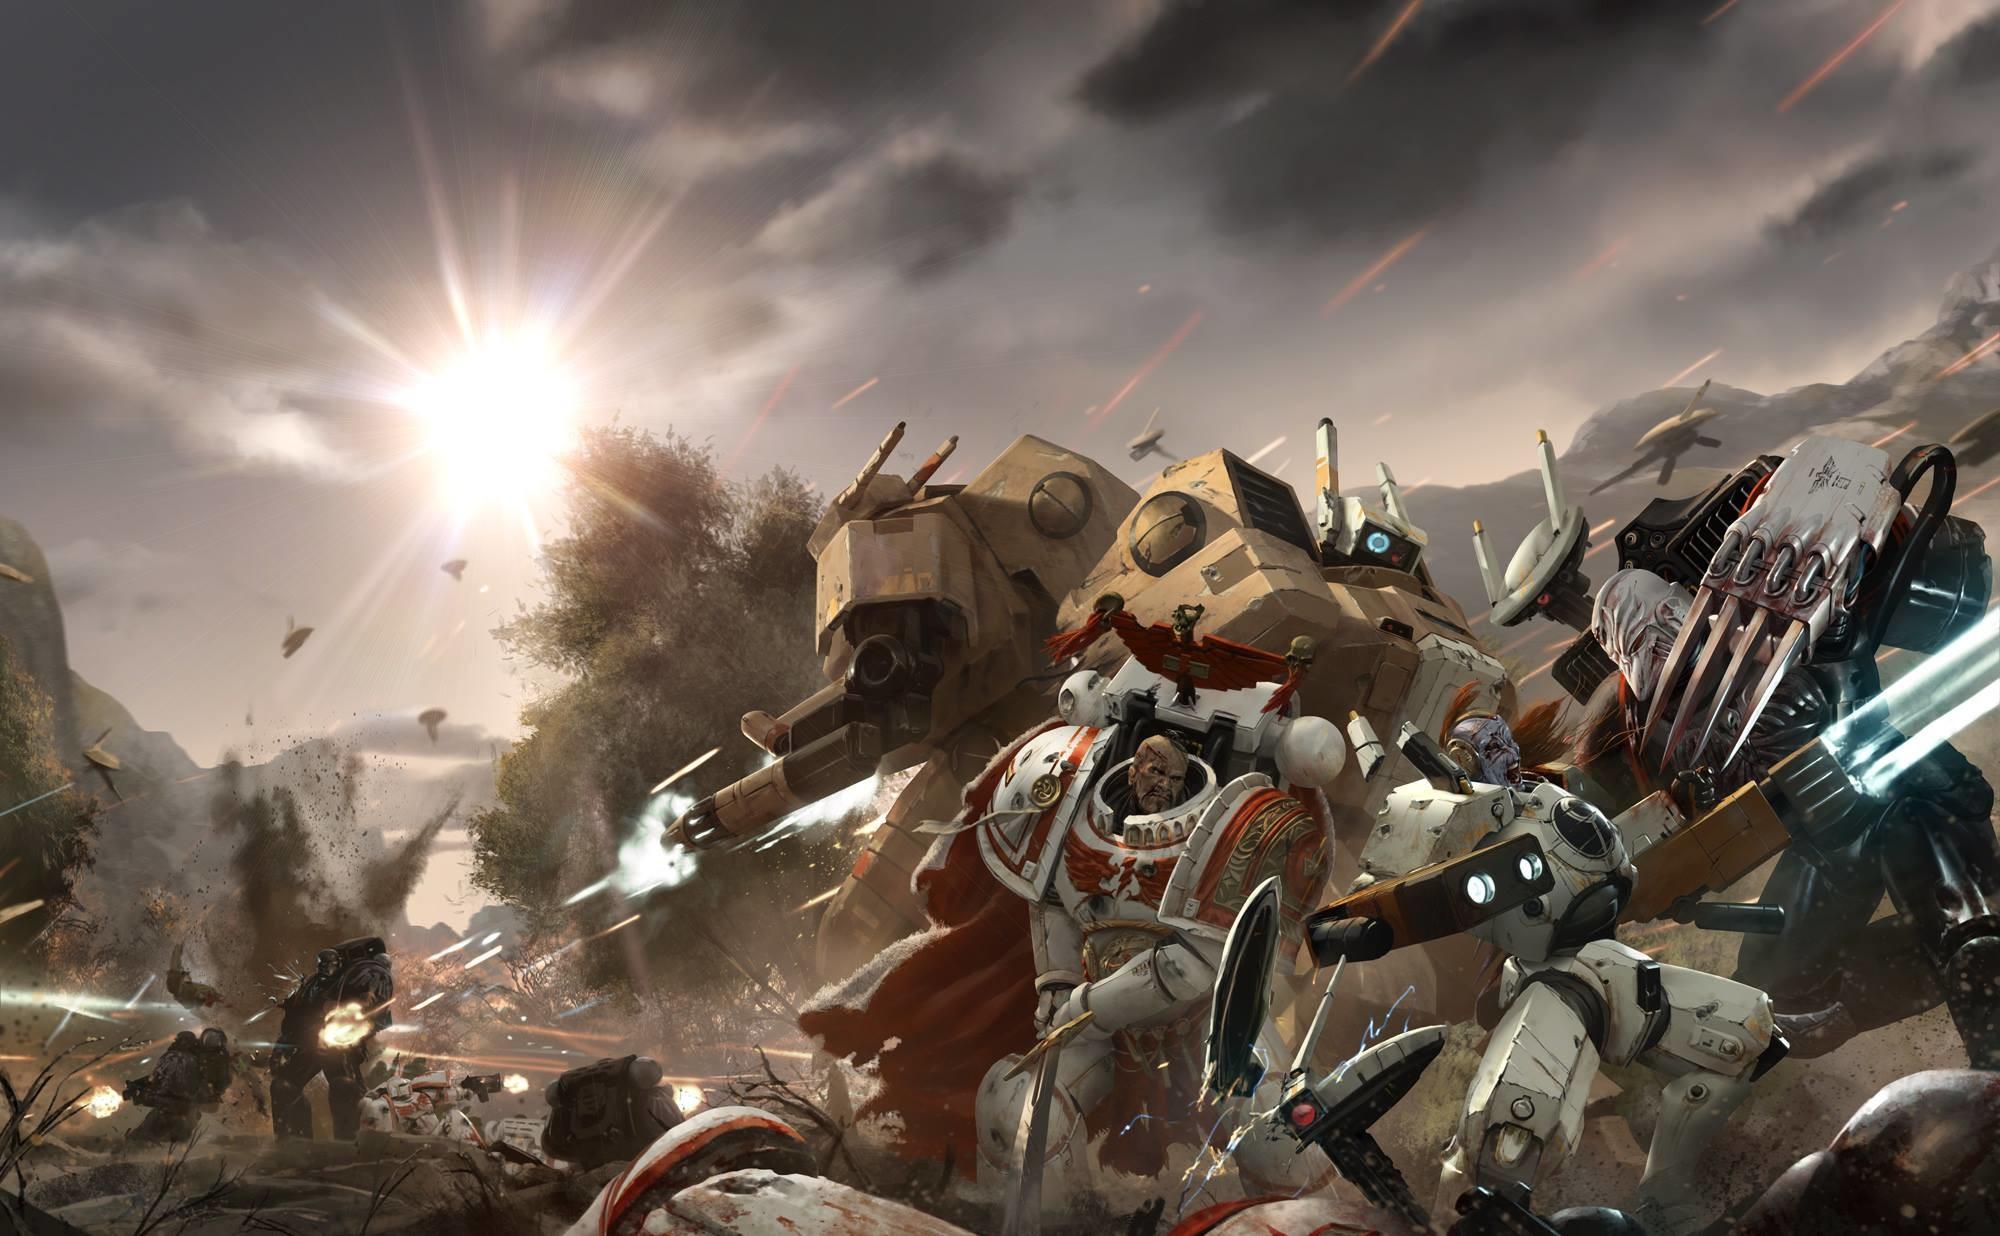 Warhammer 40K Res: / Size:245kb. Views: 4130